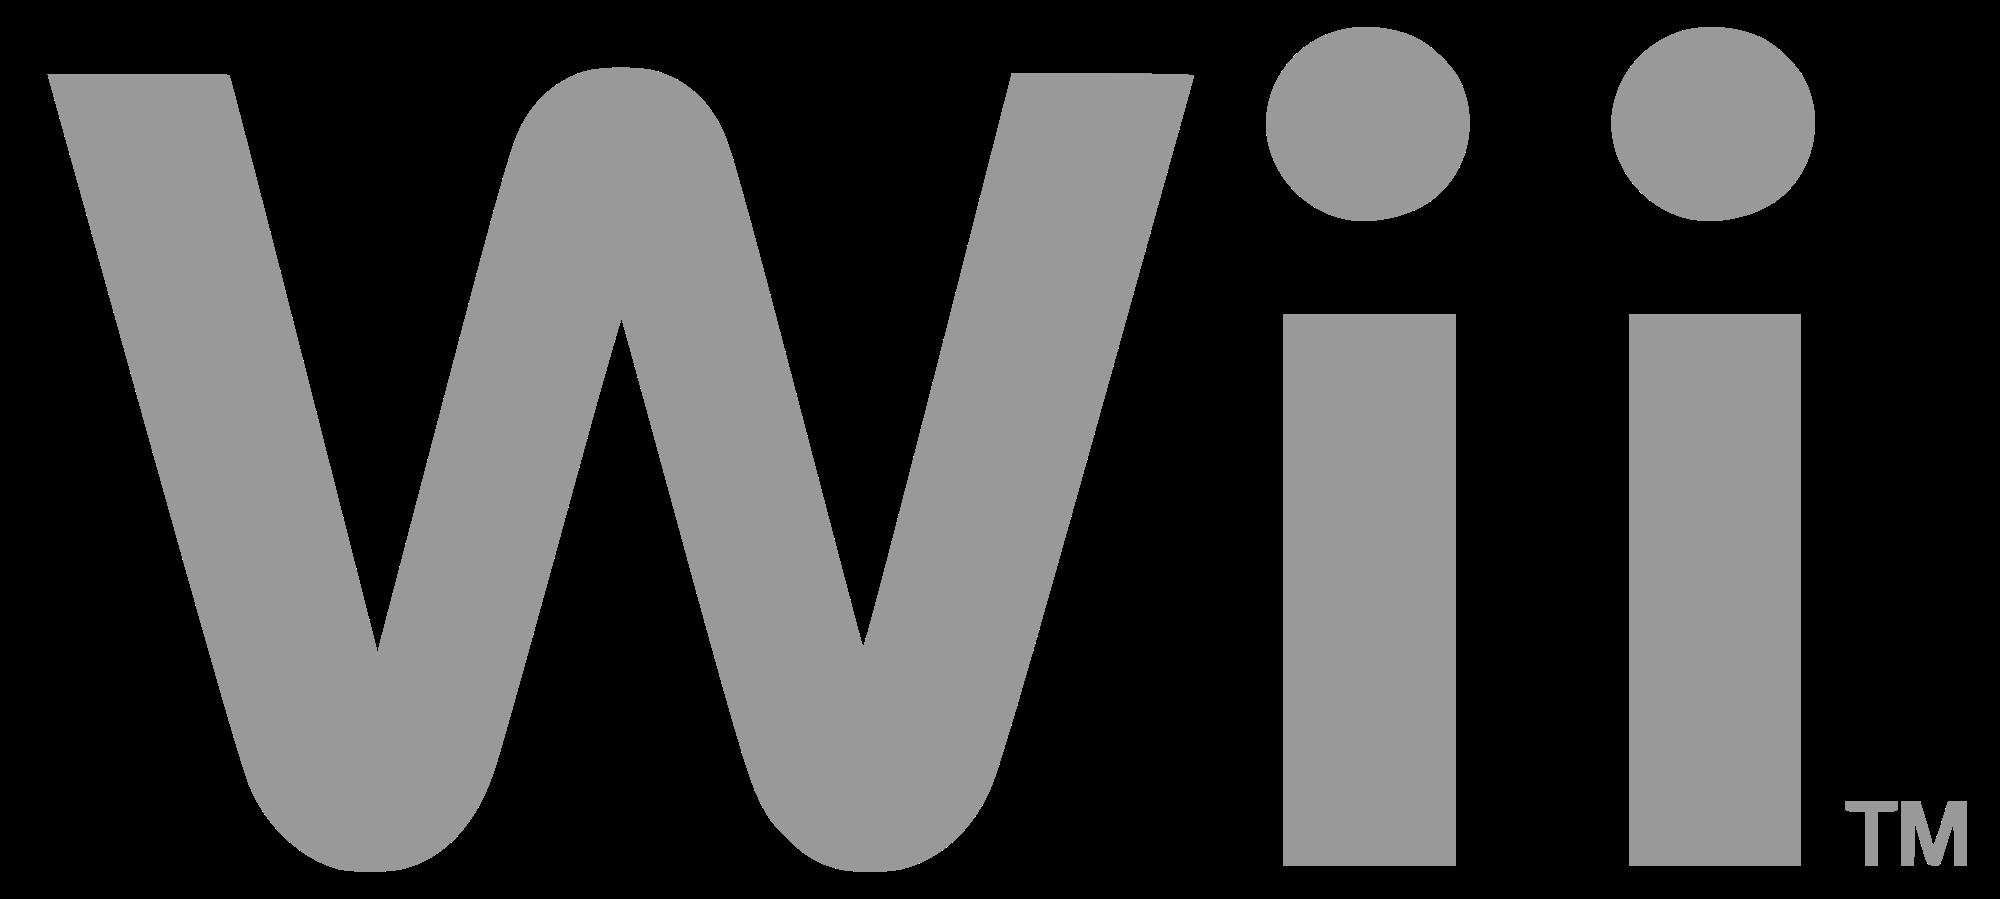 Nintendo_Wii_Logo.png